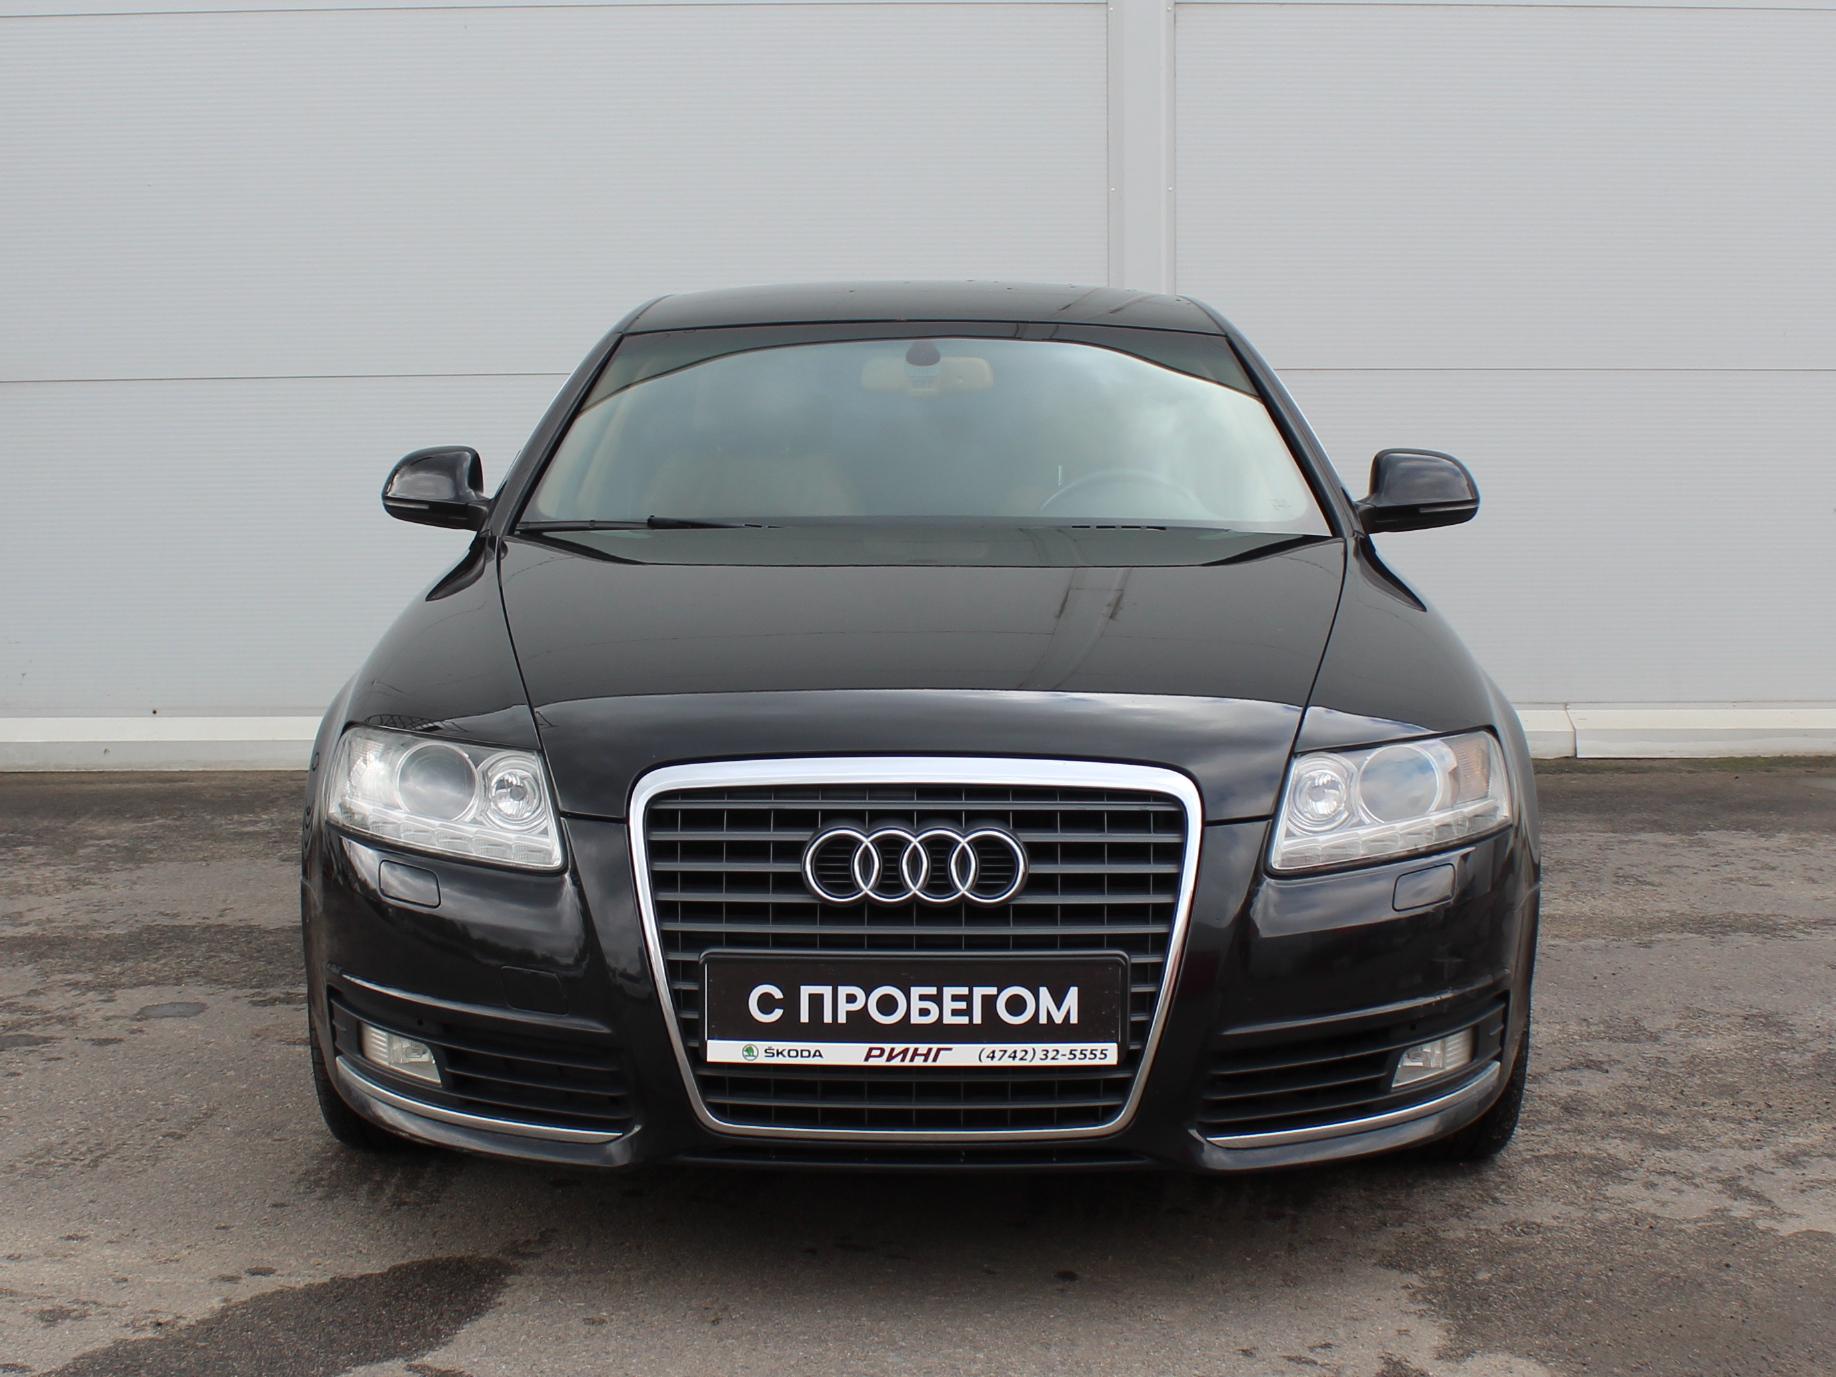 Audi A6 Седан (2008г.)